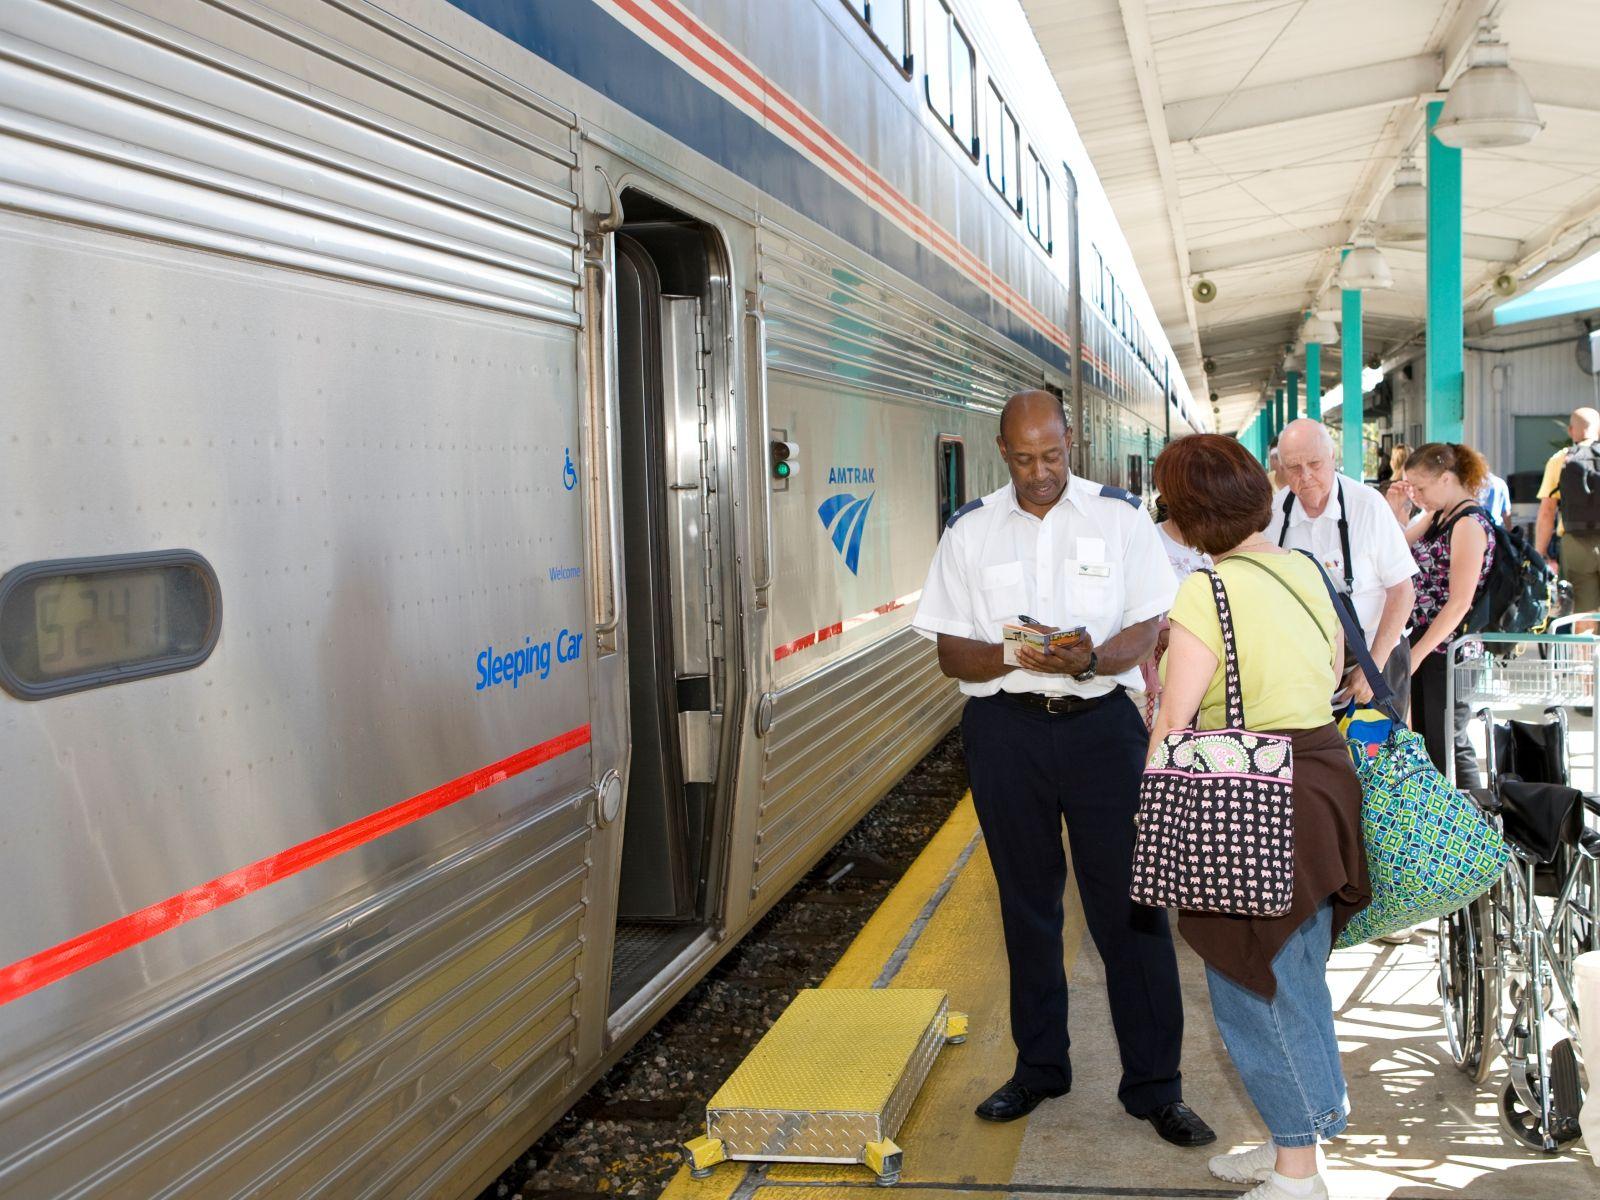 Amtrak Auto Train From Lorton VA to Florida